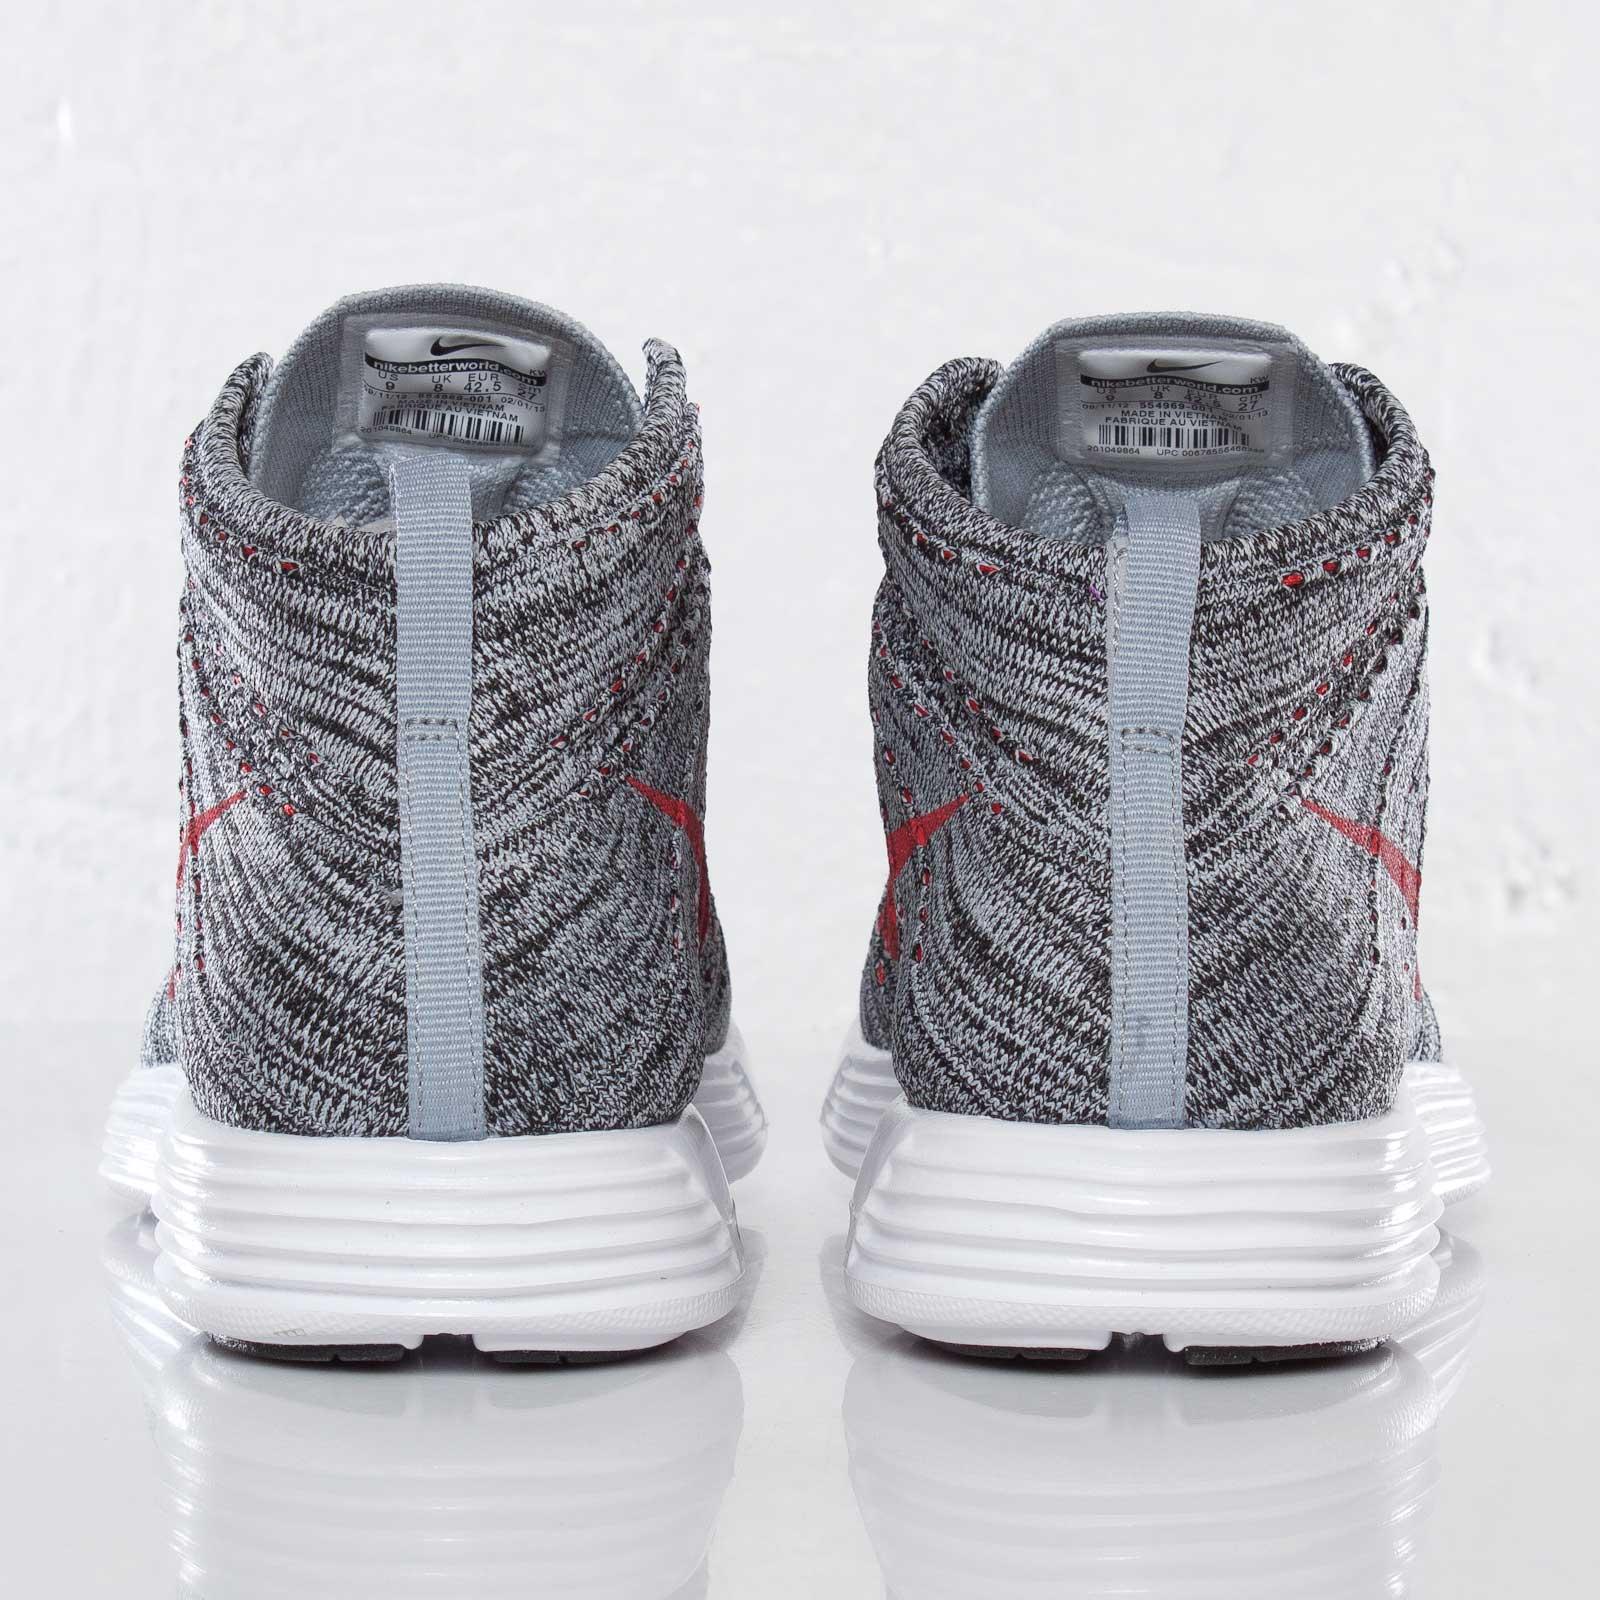 Nike Lunar Flyknit Chukka 554969 001 Sneakersnstuff I